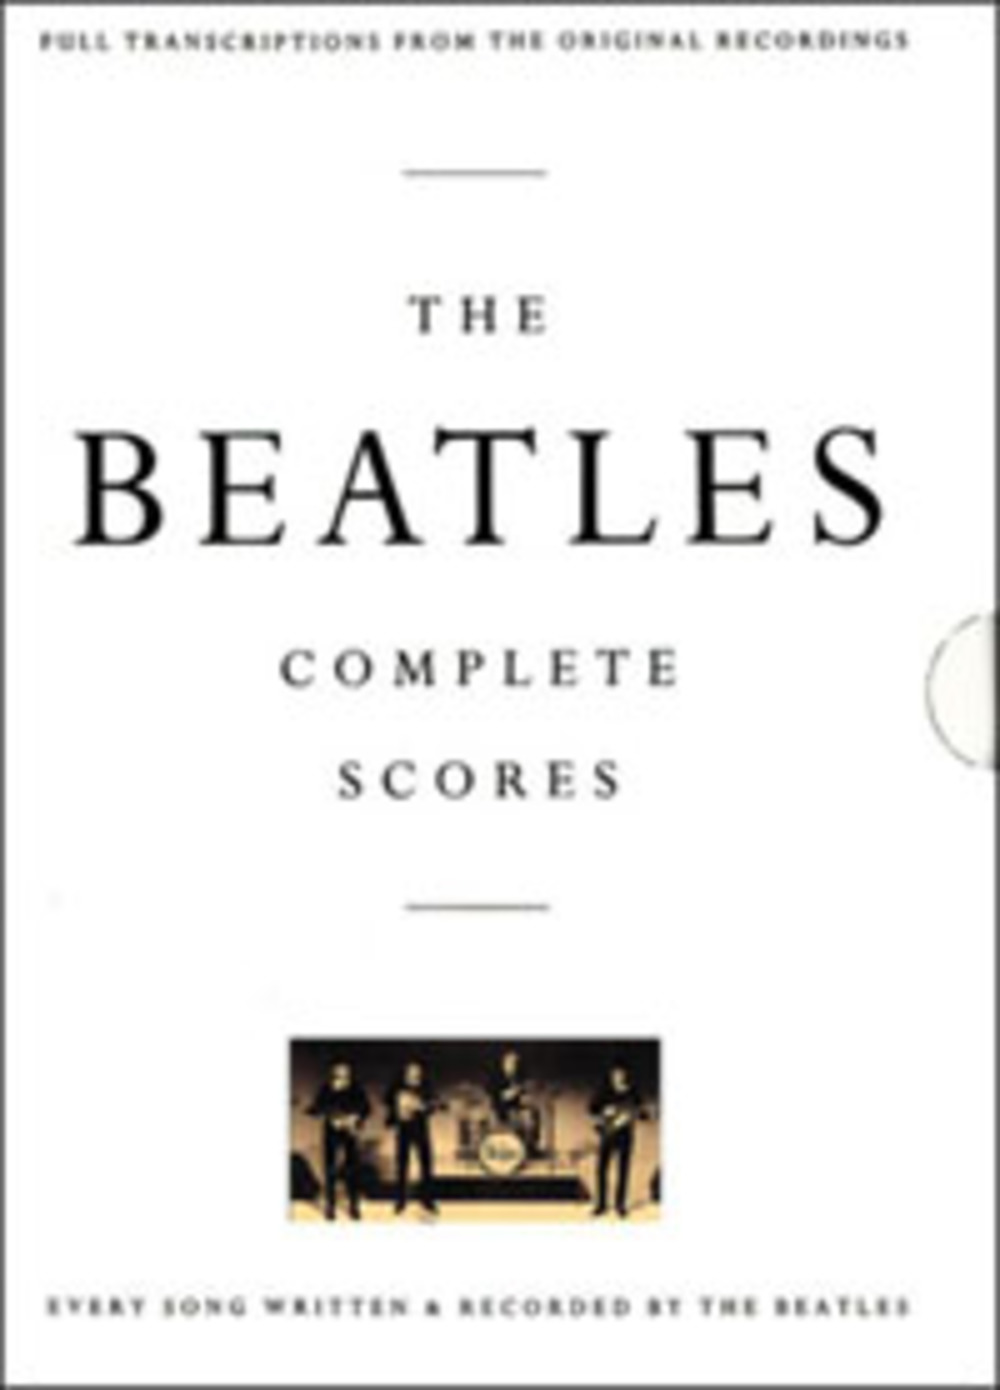 Beatles: Complete Scores